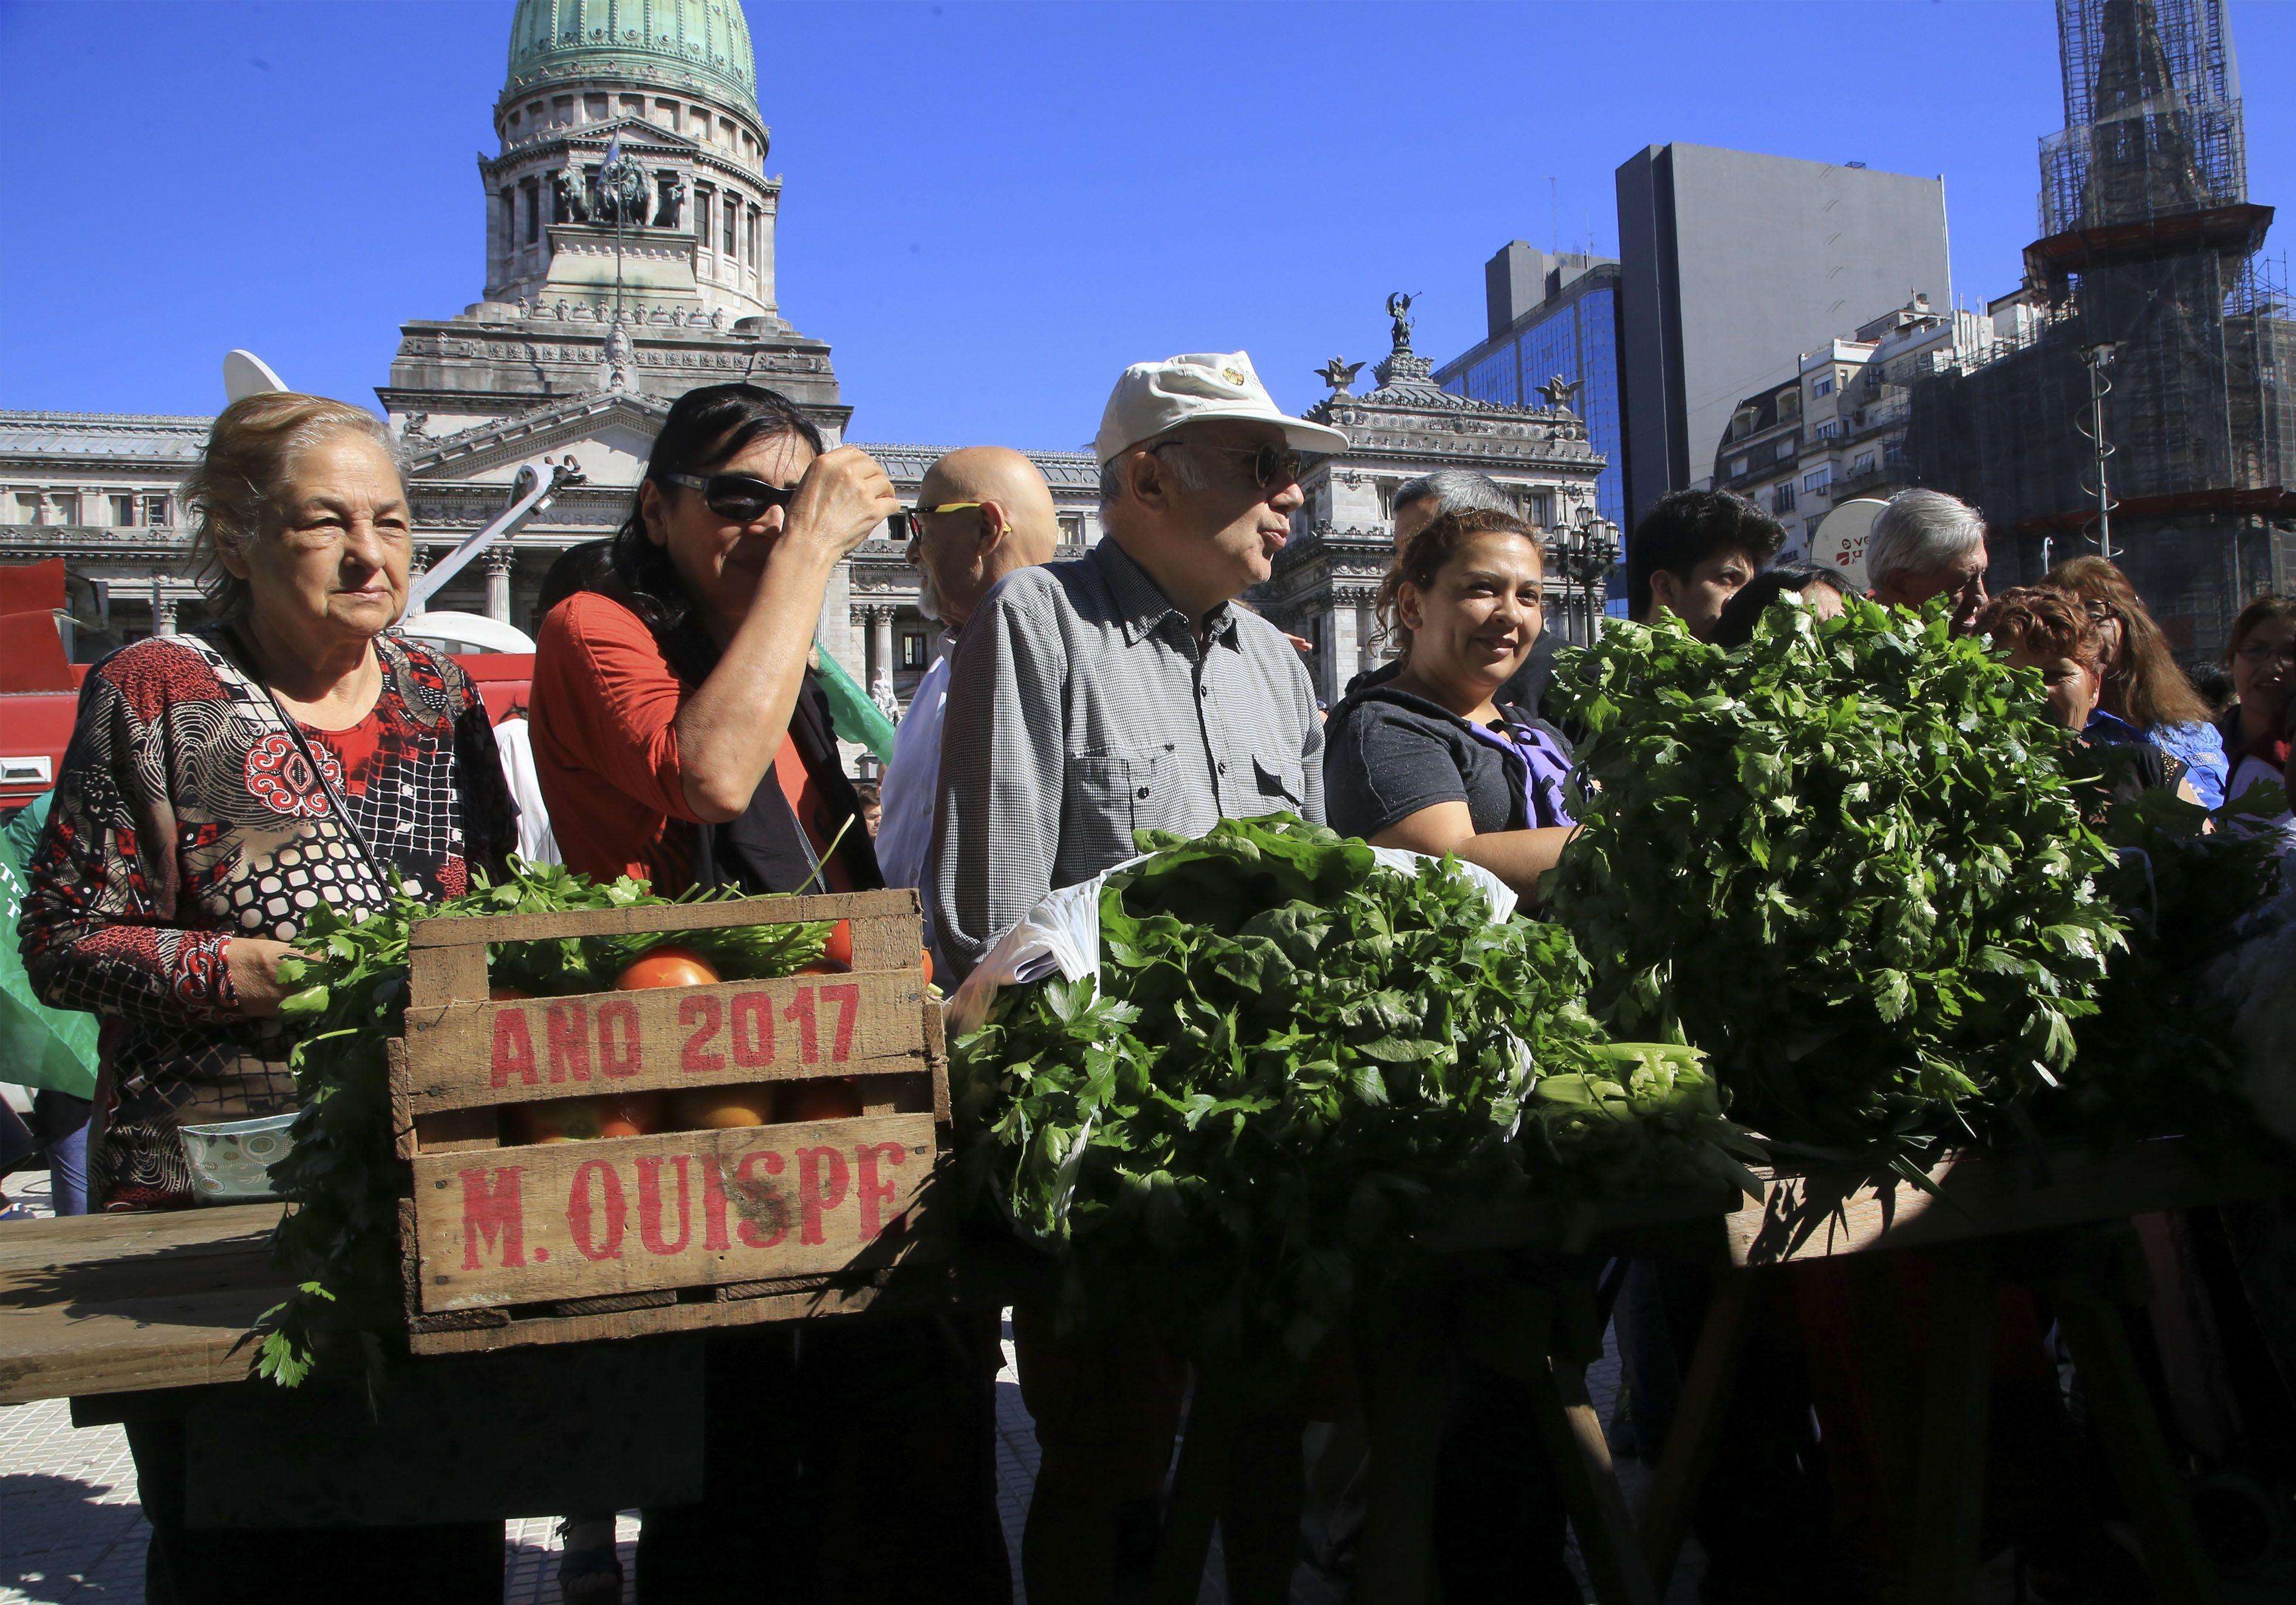 Cientos de personas buscaron las verduras que obsequiaban a modo de protesta en Plaza Congreso